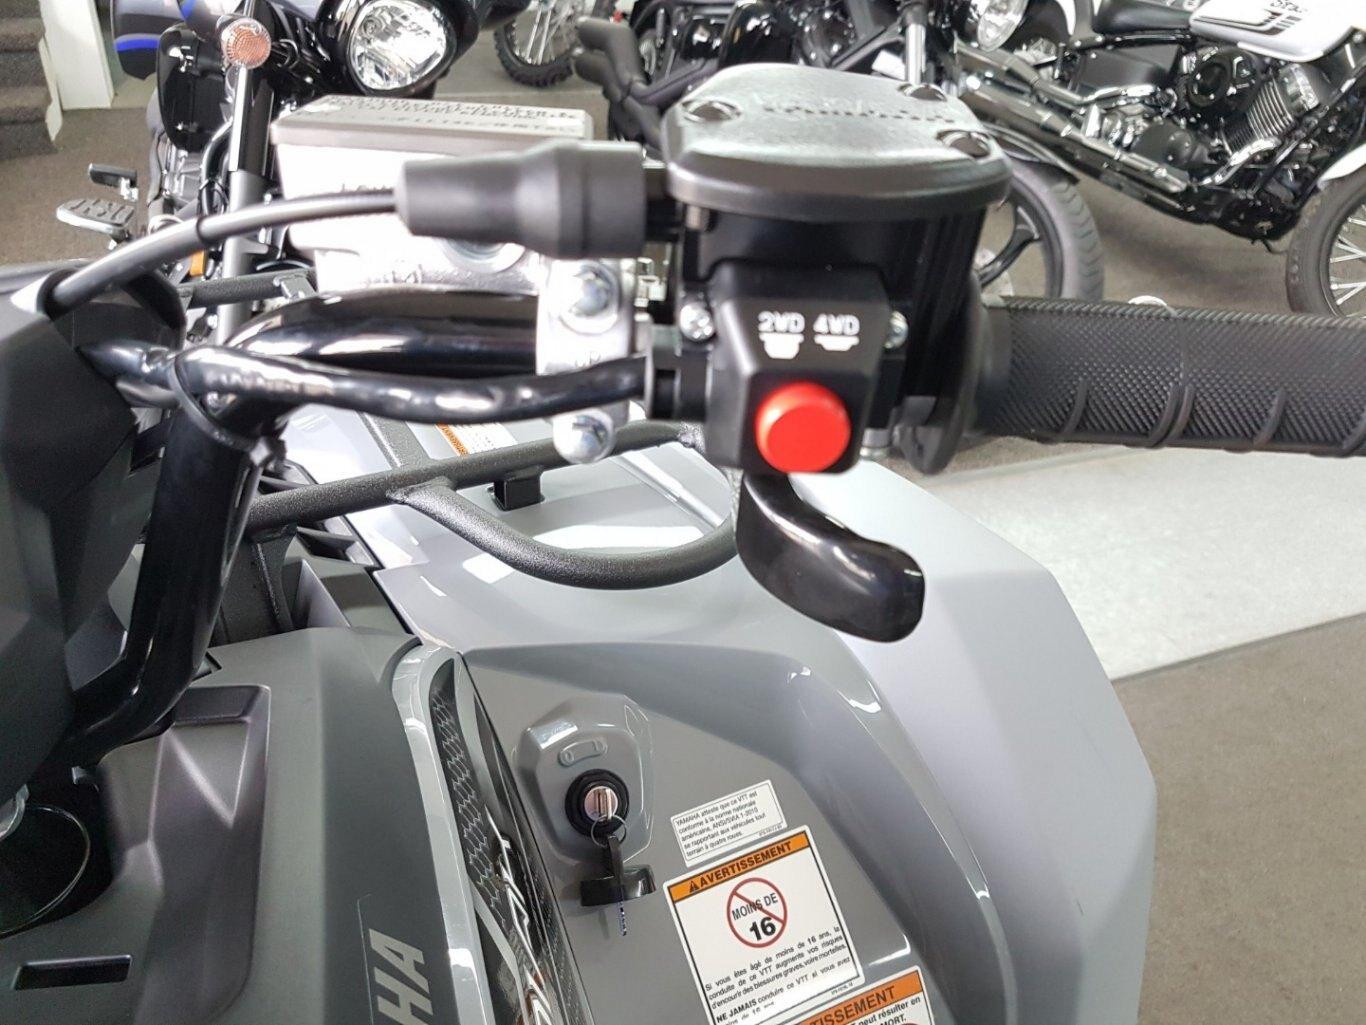 Atvs Yamaha 5 Star Motorcycle Dealer In Weyburn Saskatchewan Kodiak 450 Fuel Filter 2018 Eps